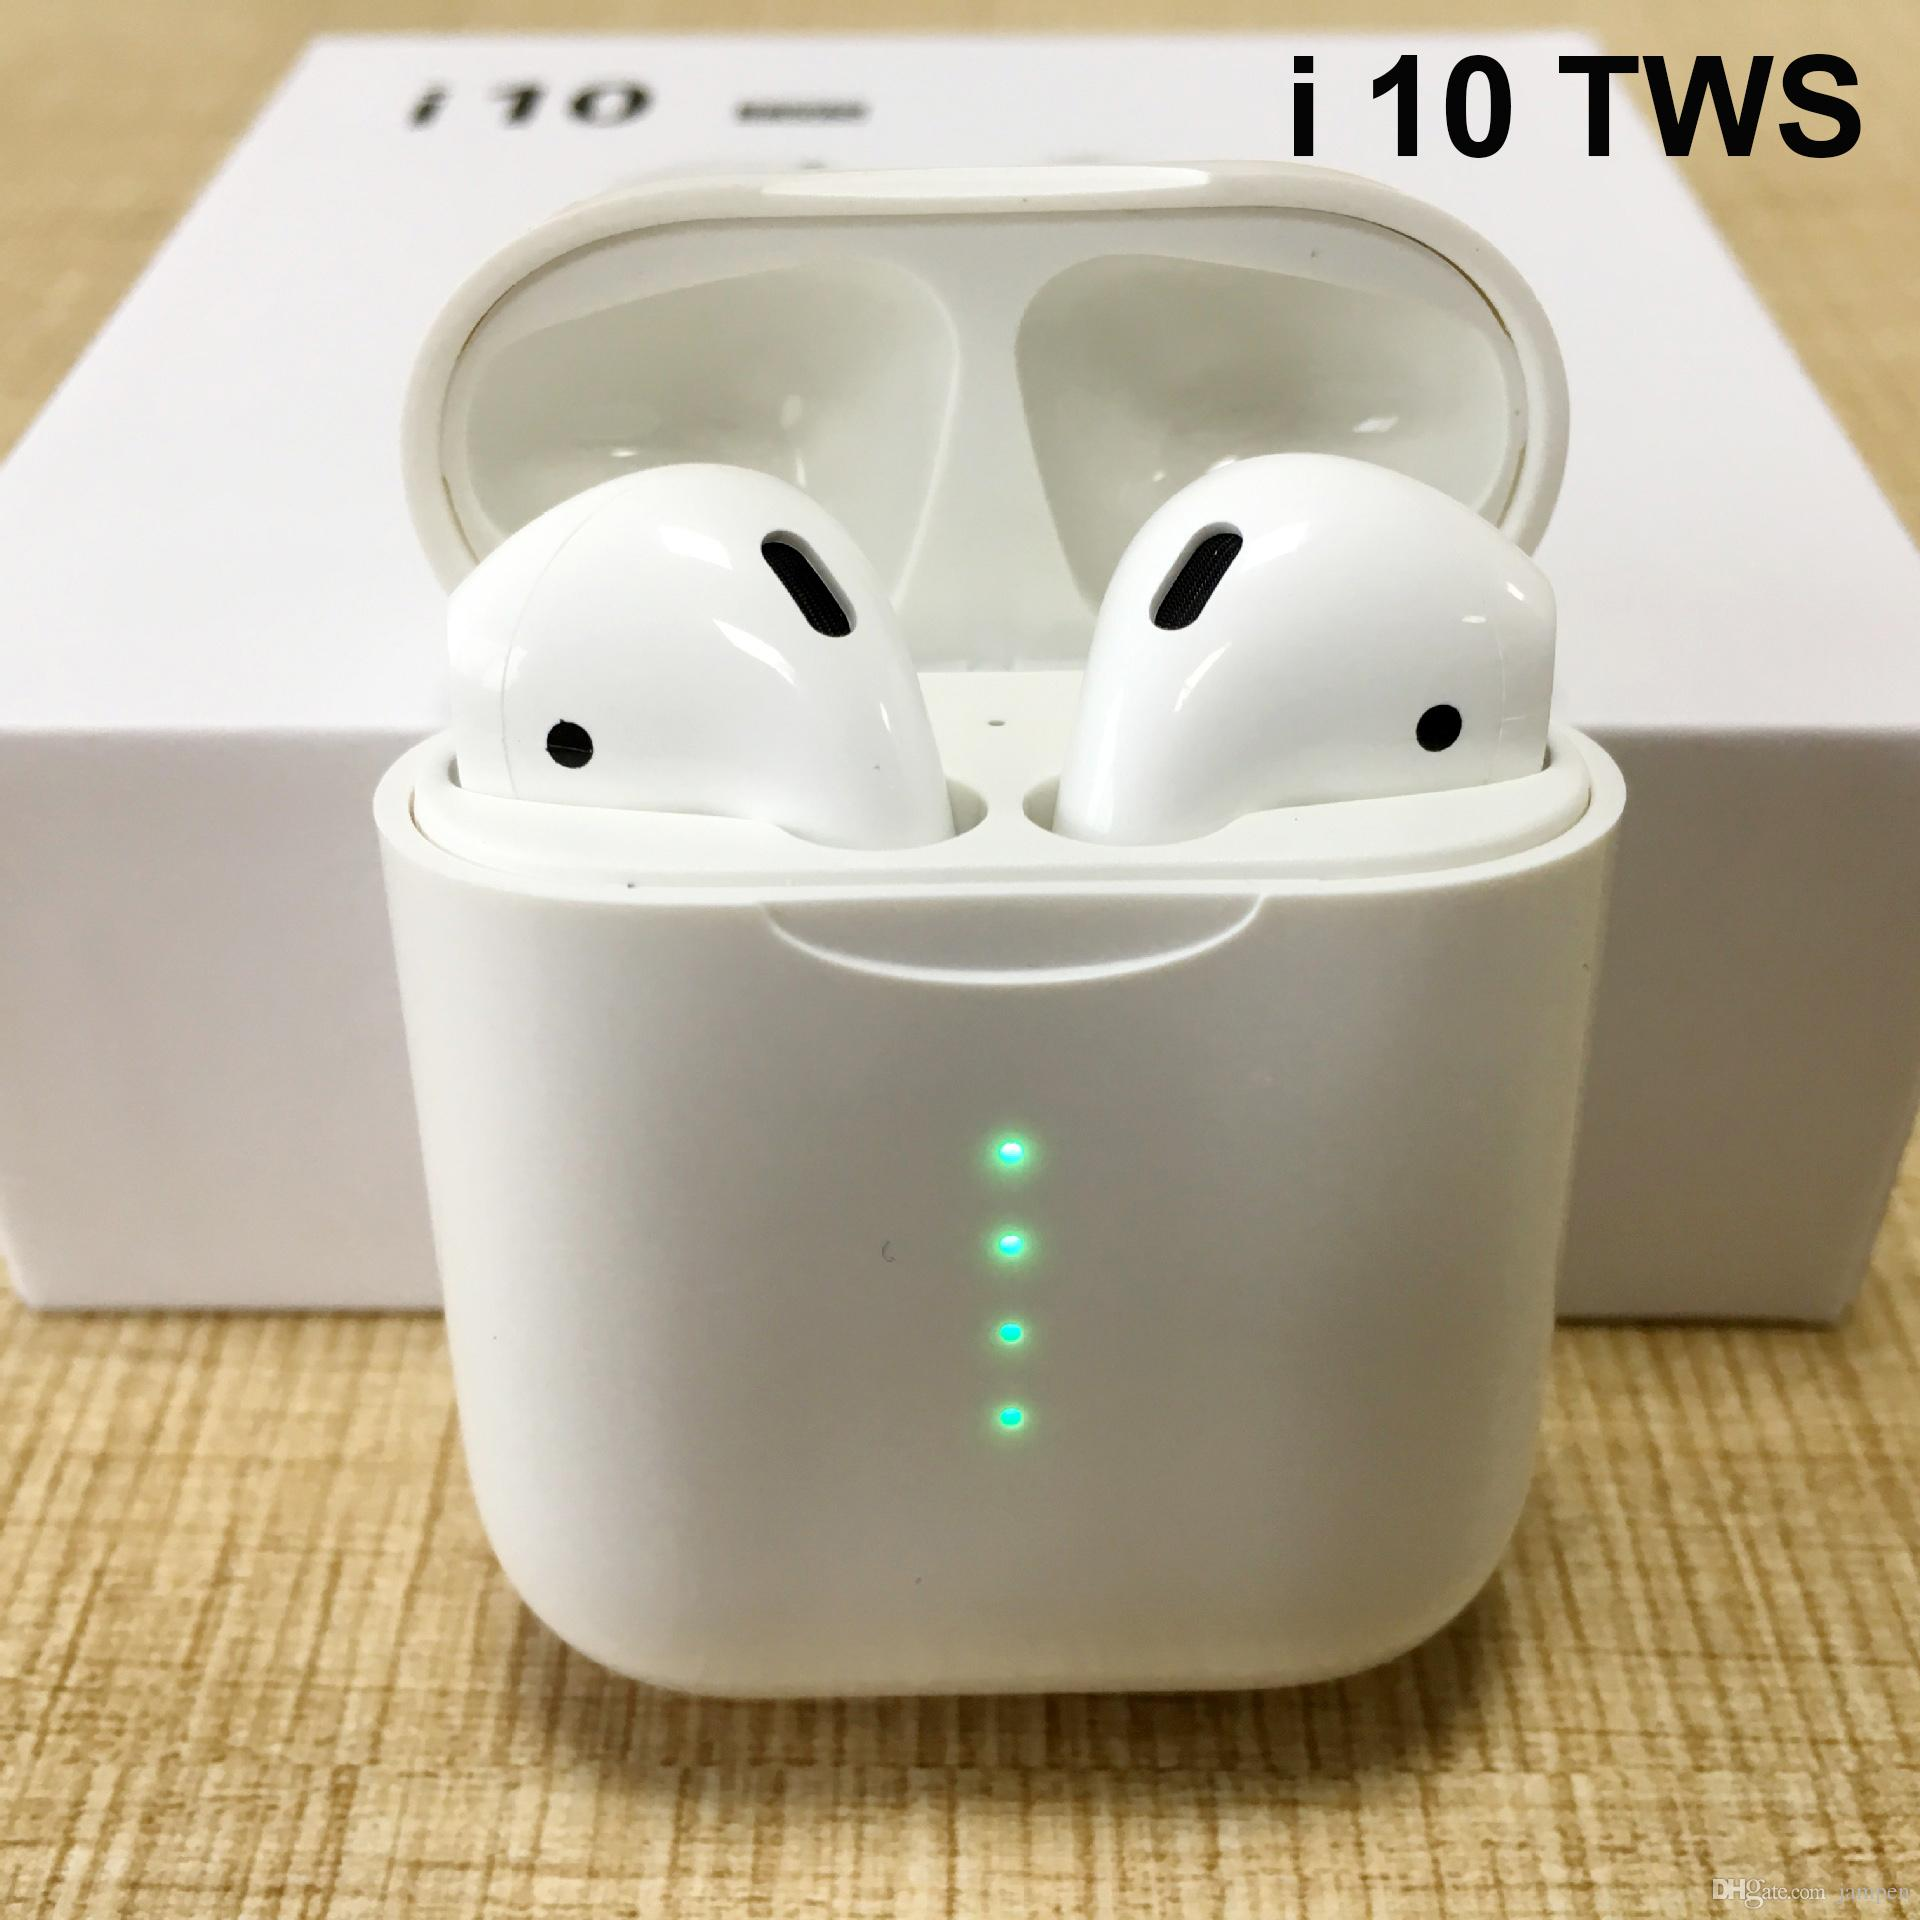 RAVI i10 tws /i9s tws  Wireless Bluetooth Headsets tws i10 Headphones for all iPhoneX/XS MAX air dots i12RAVI i10 tws /i9s tws  Wireless Bluetooth Headsets tws i10 Headphones for all iPhoneX/XS MAX air dots i12